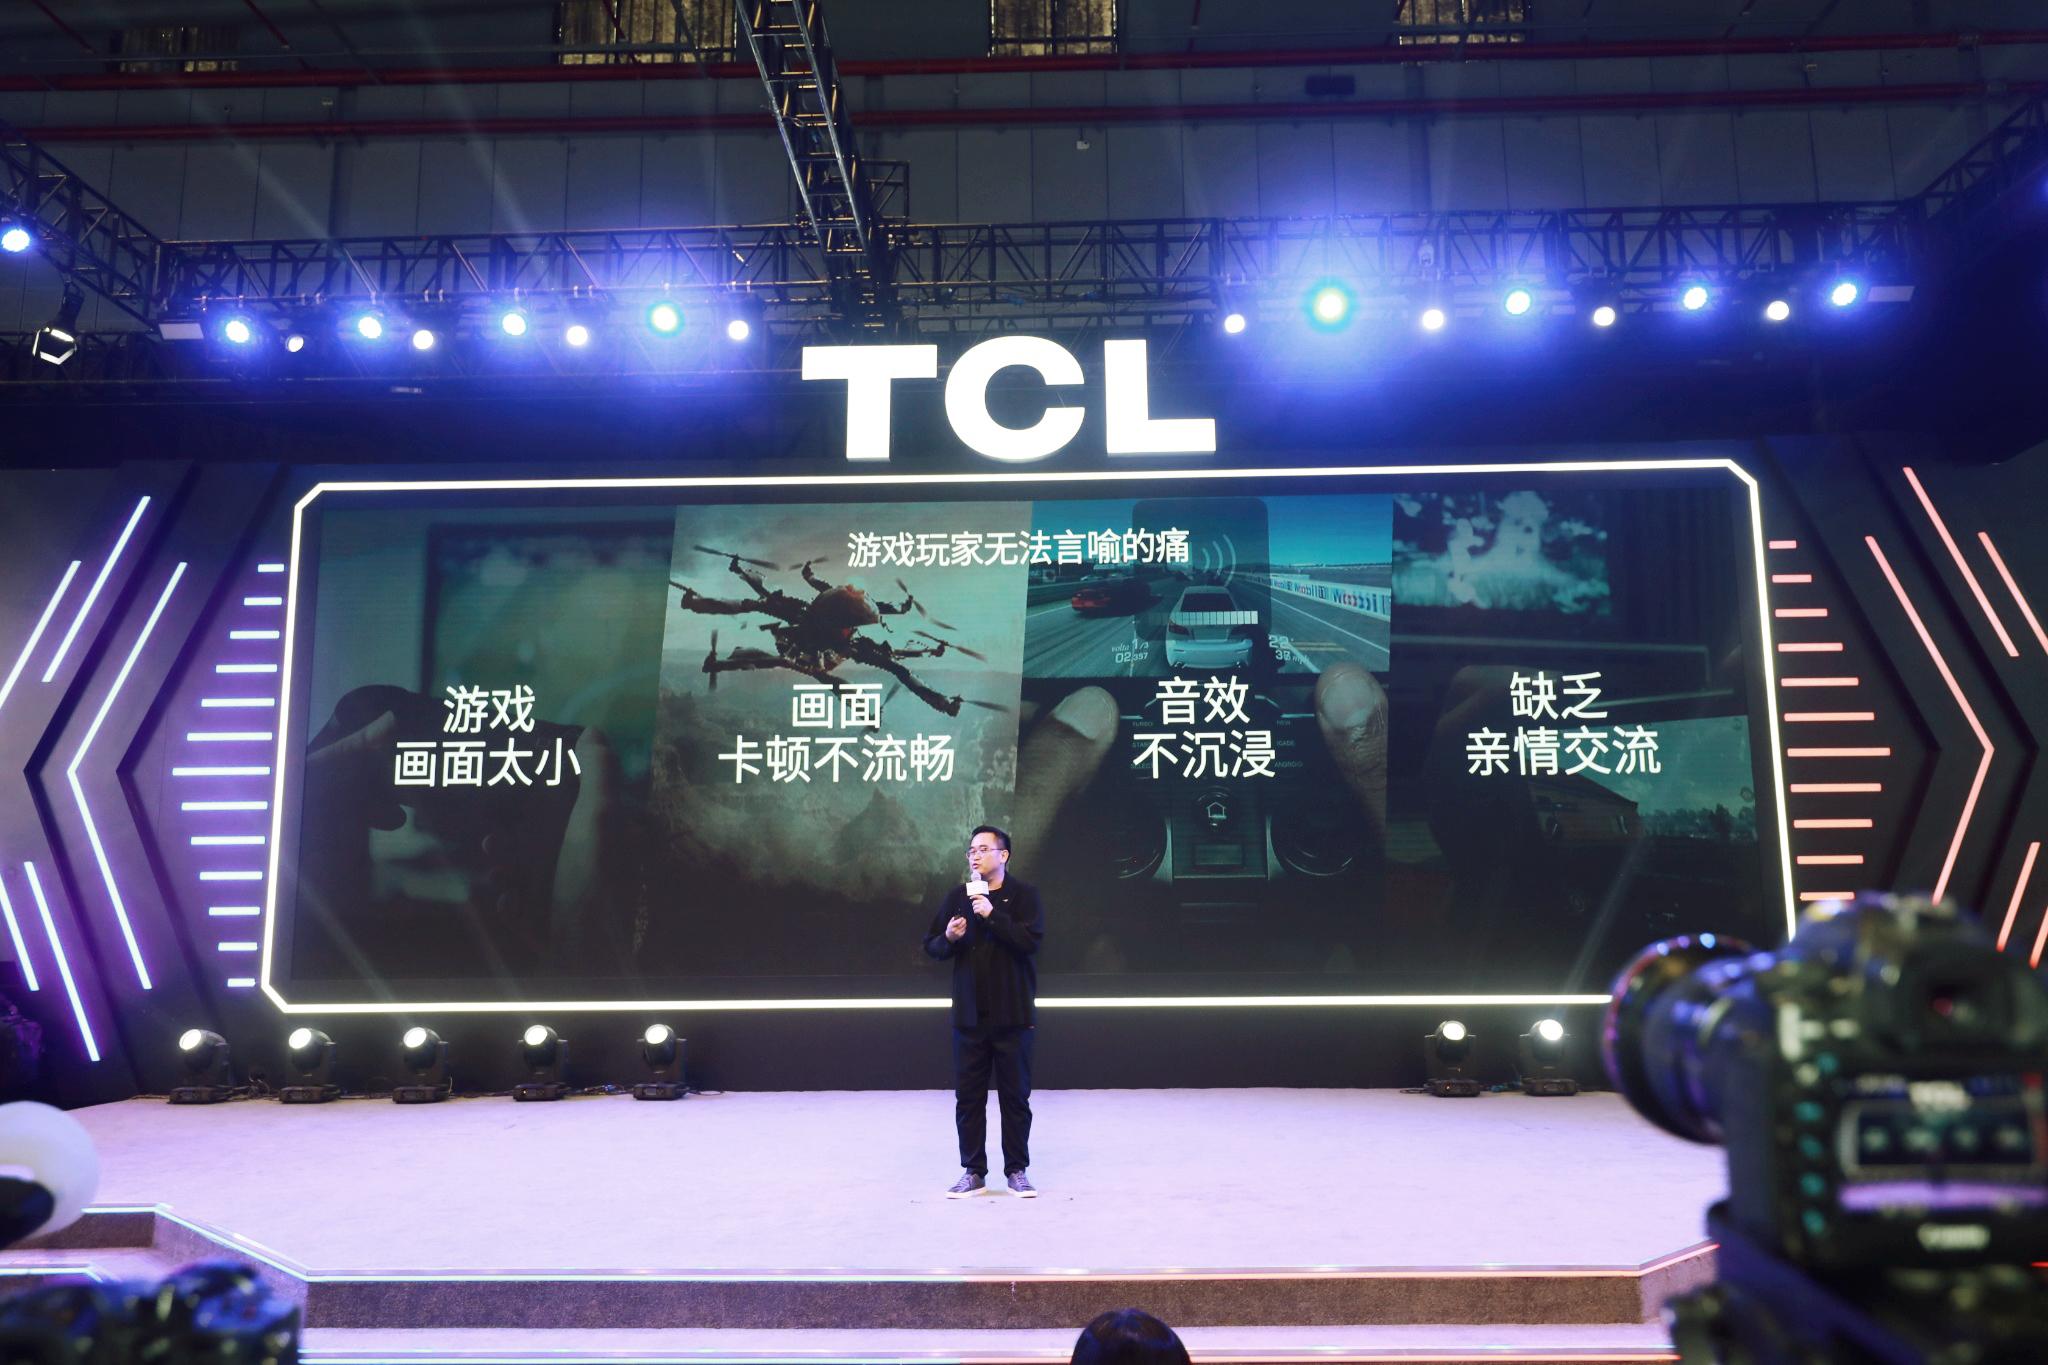 TCL正式签约电竞豪门EDG,强强联合奔赴电竞之路-最极客